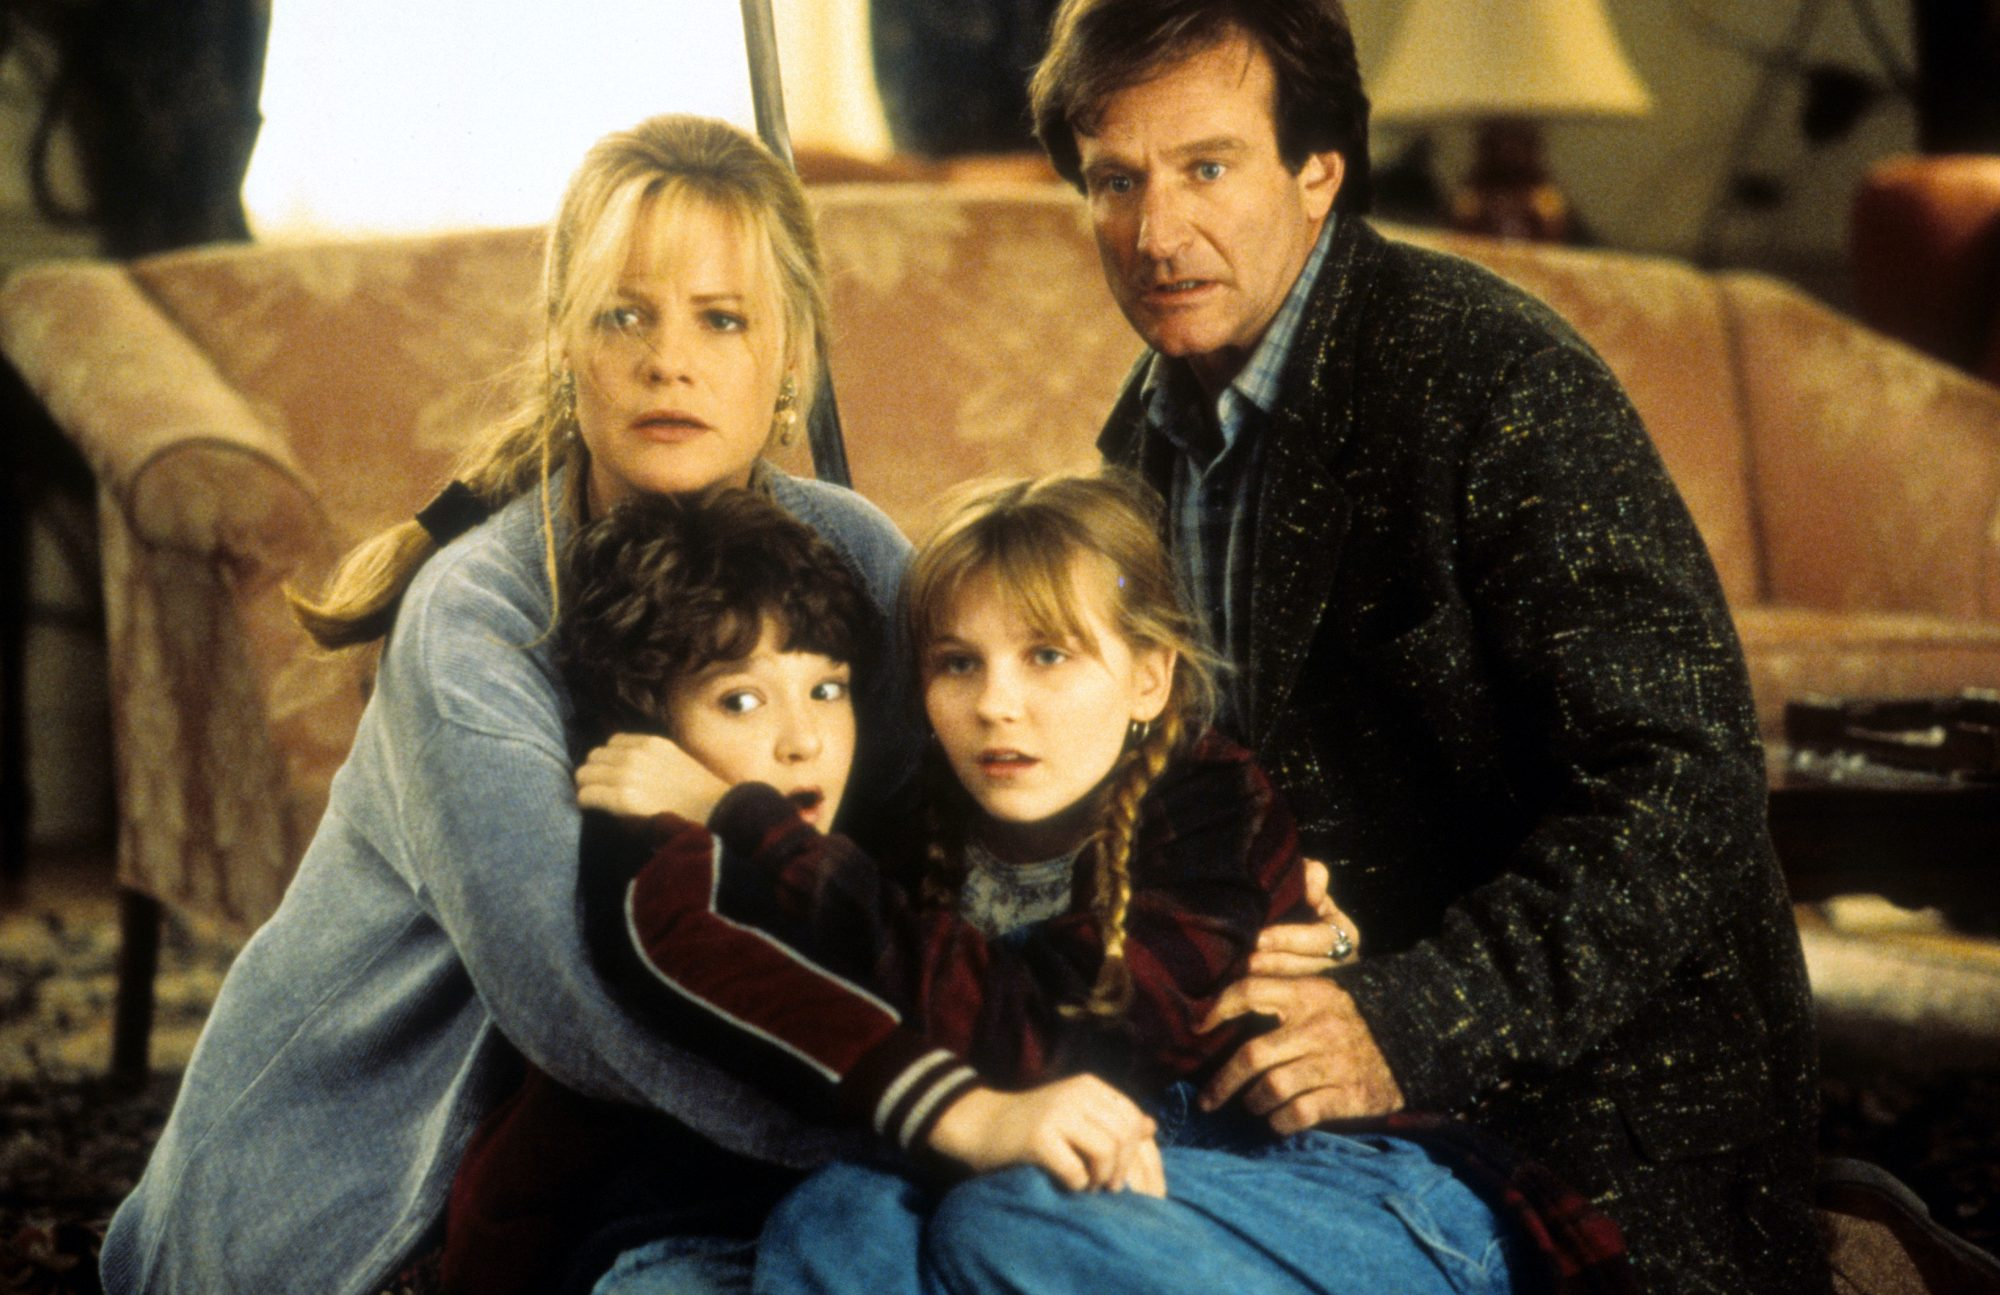 Bonnie Hunt And Robin Williams In 'Jumanji'